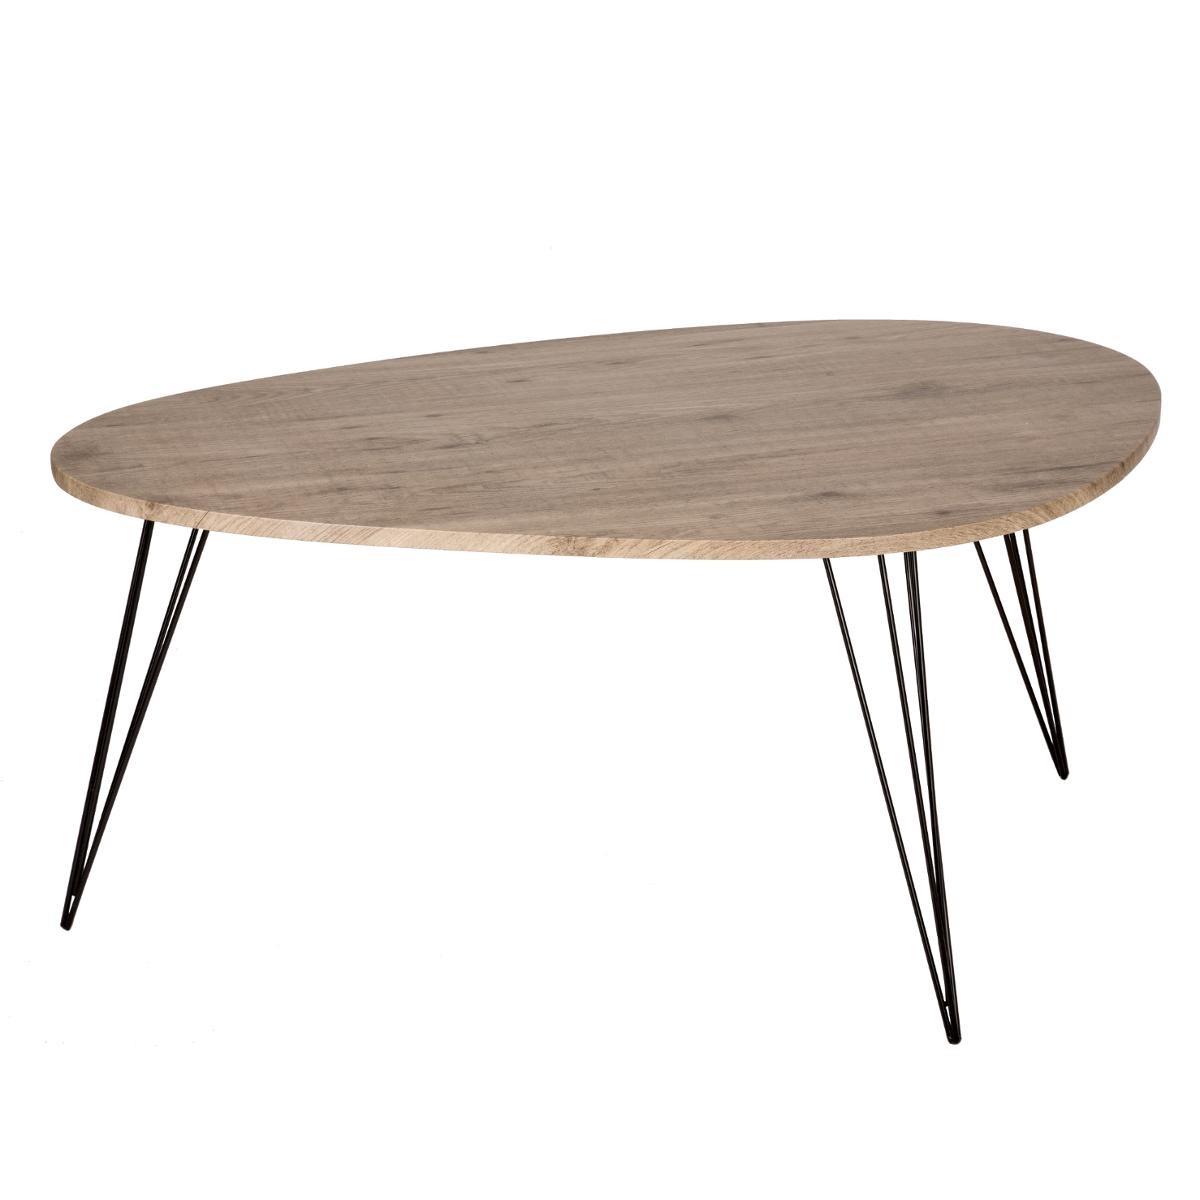 TABLE BASSE NEILE MOYEN MODÈLE